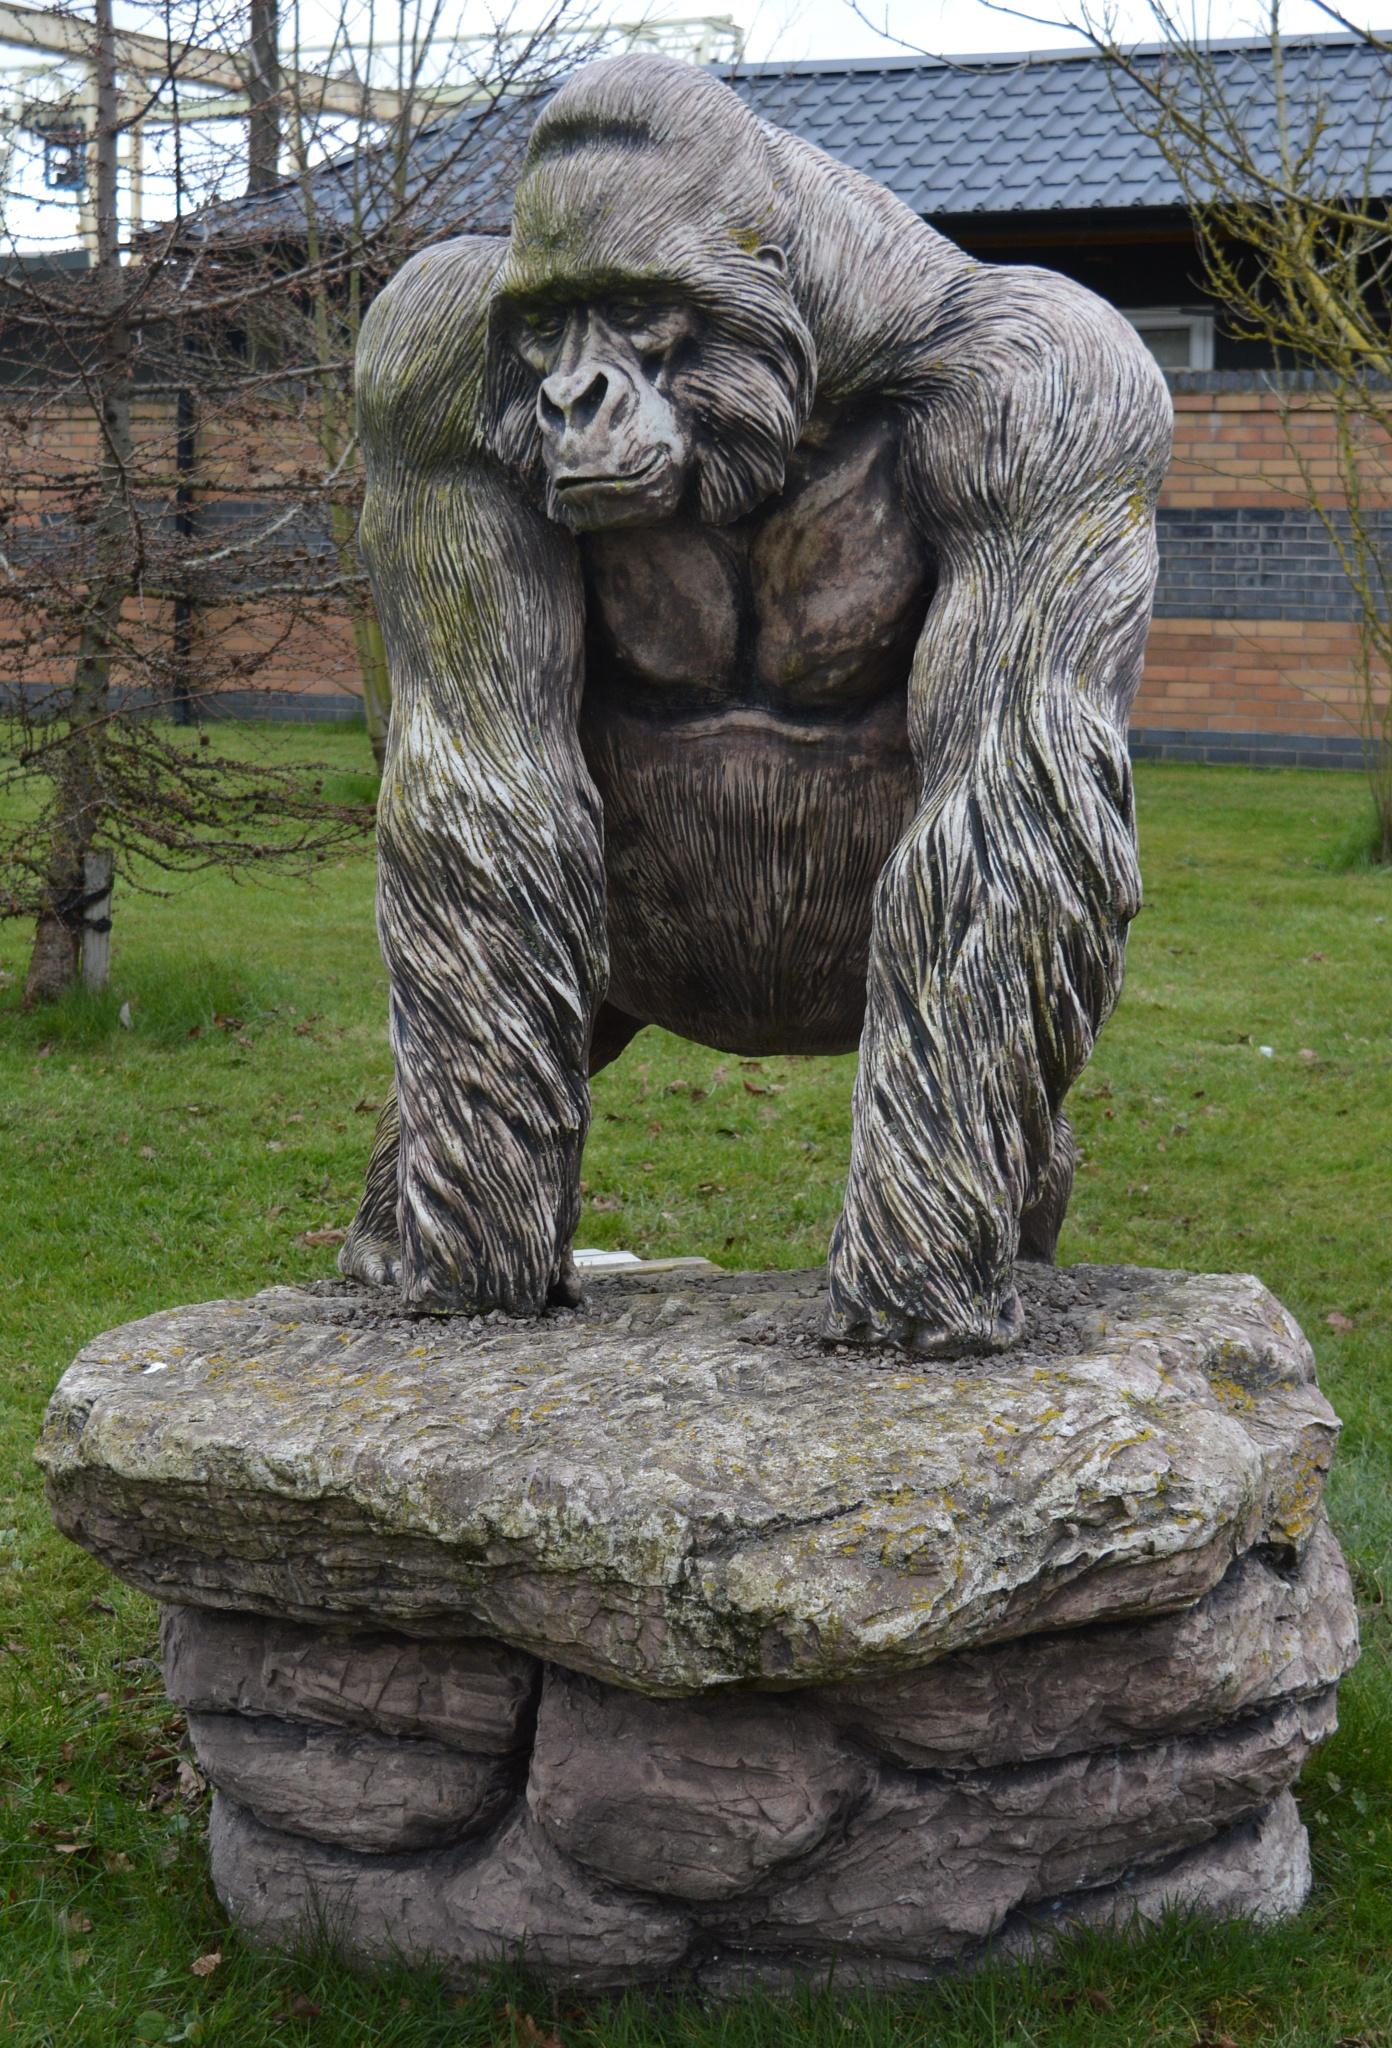 Gorilla 2 by declan delaney